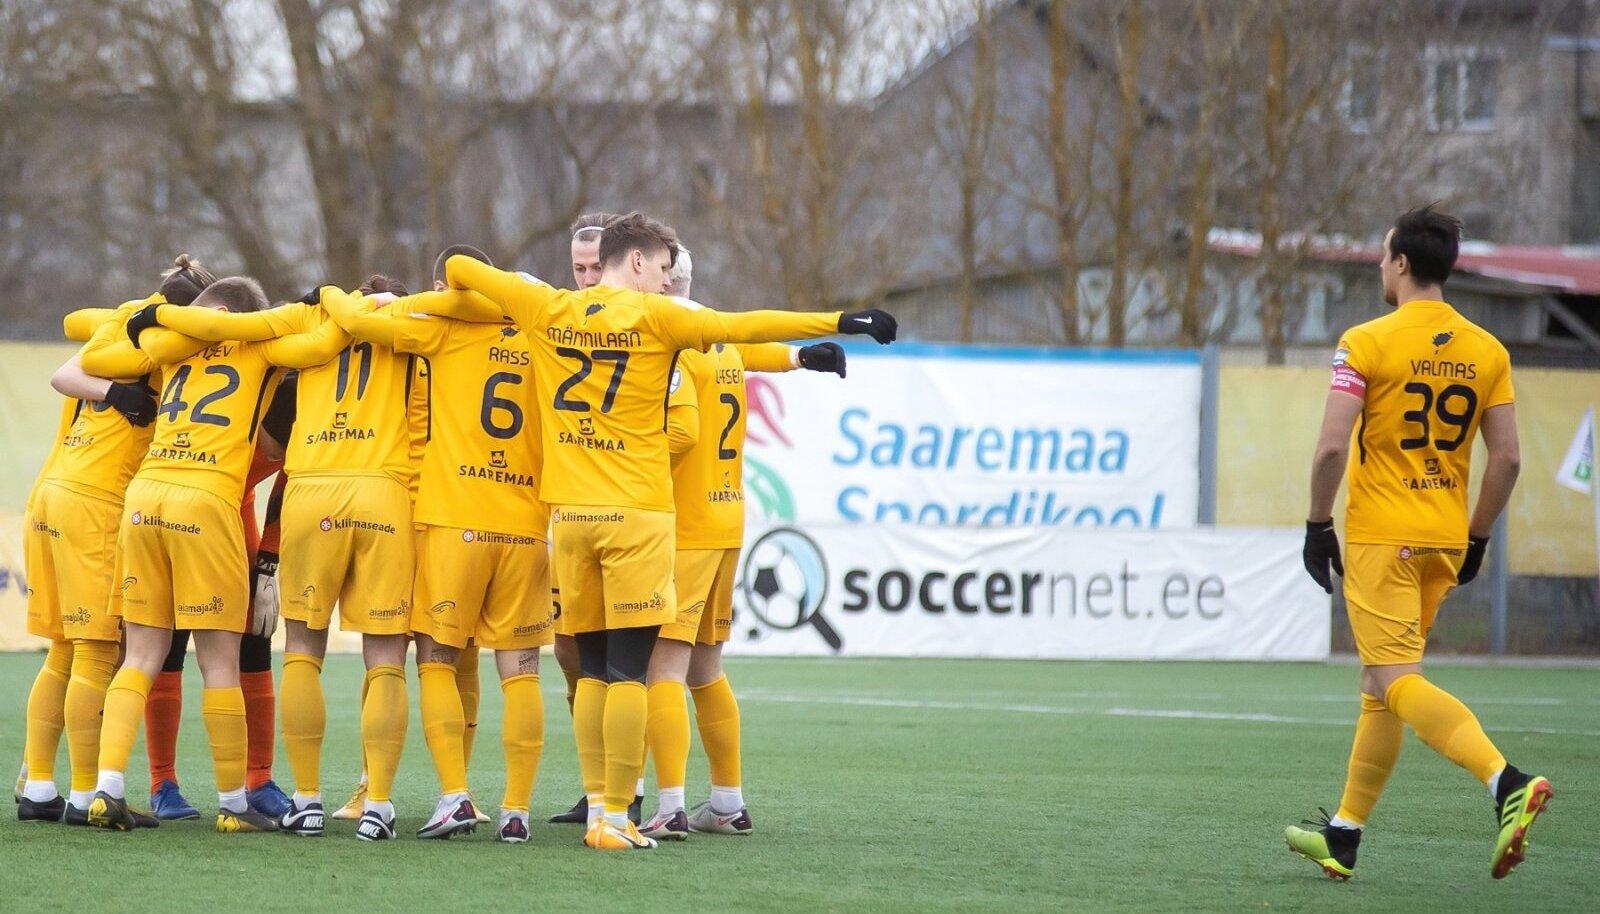 Premium 24, FC Kuressaare, Maardu linnameeskond